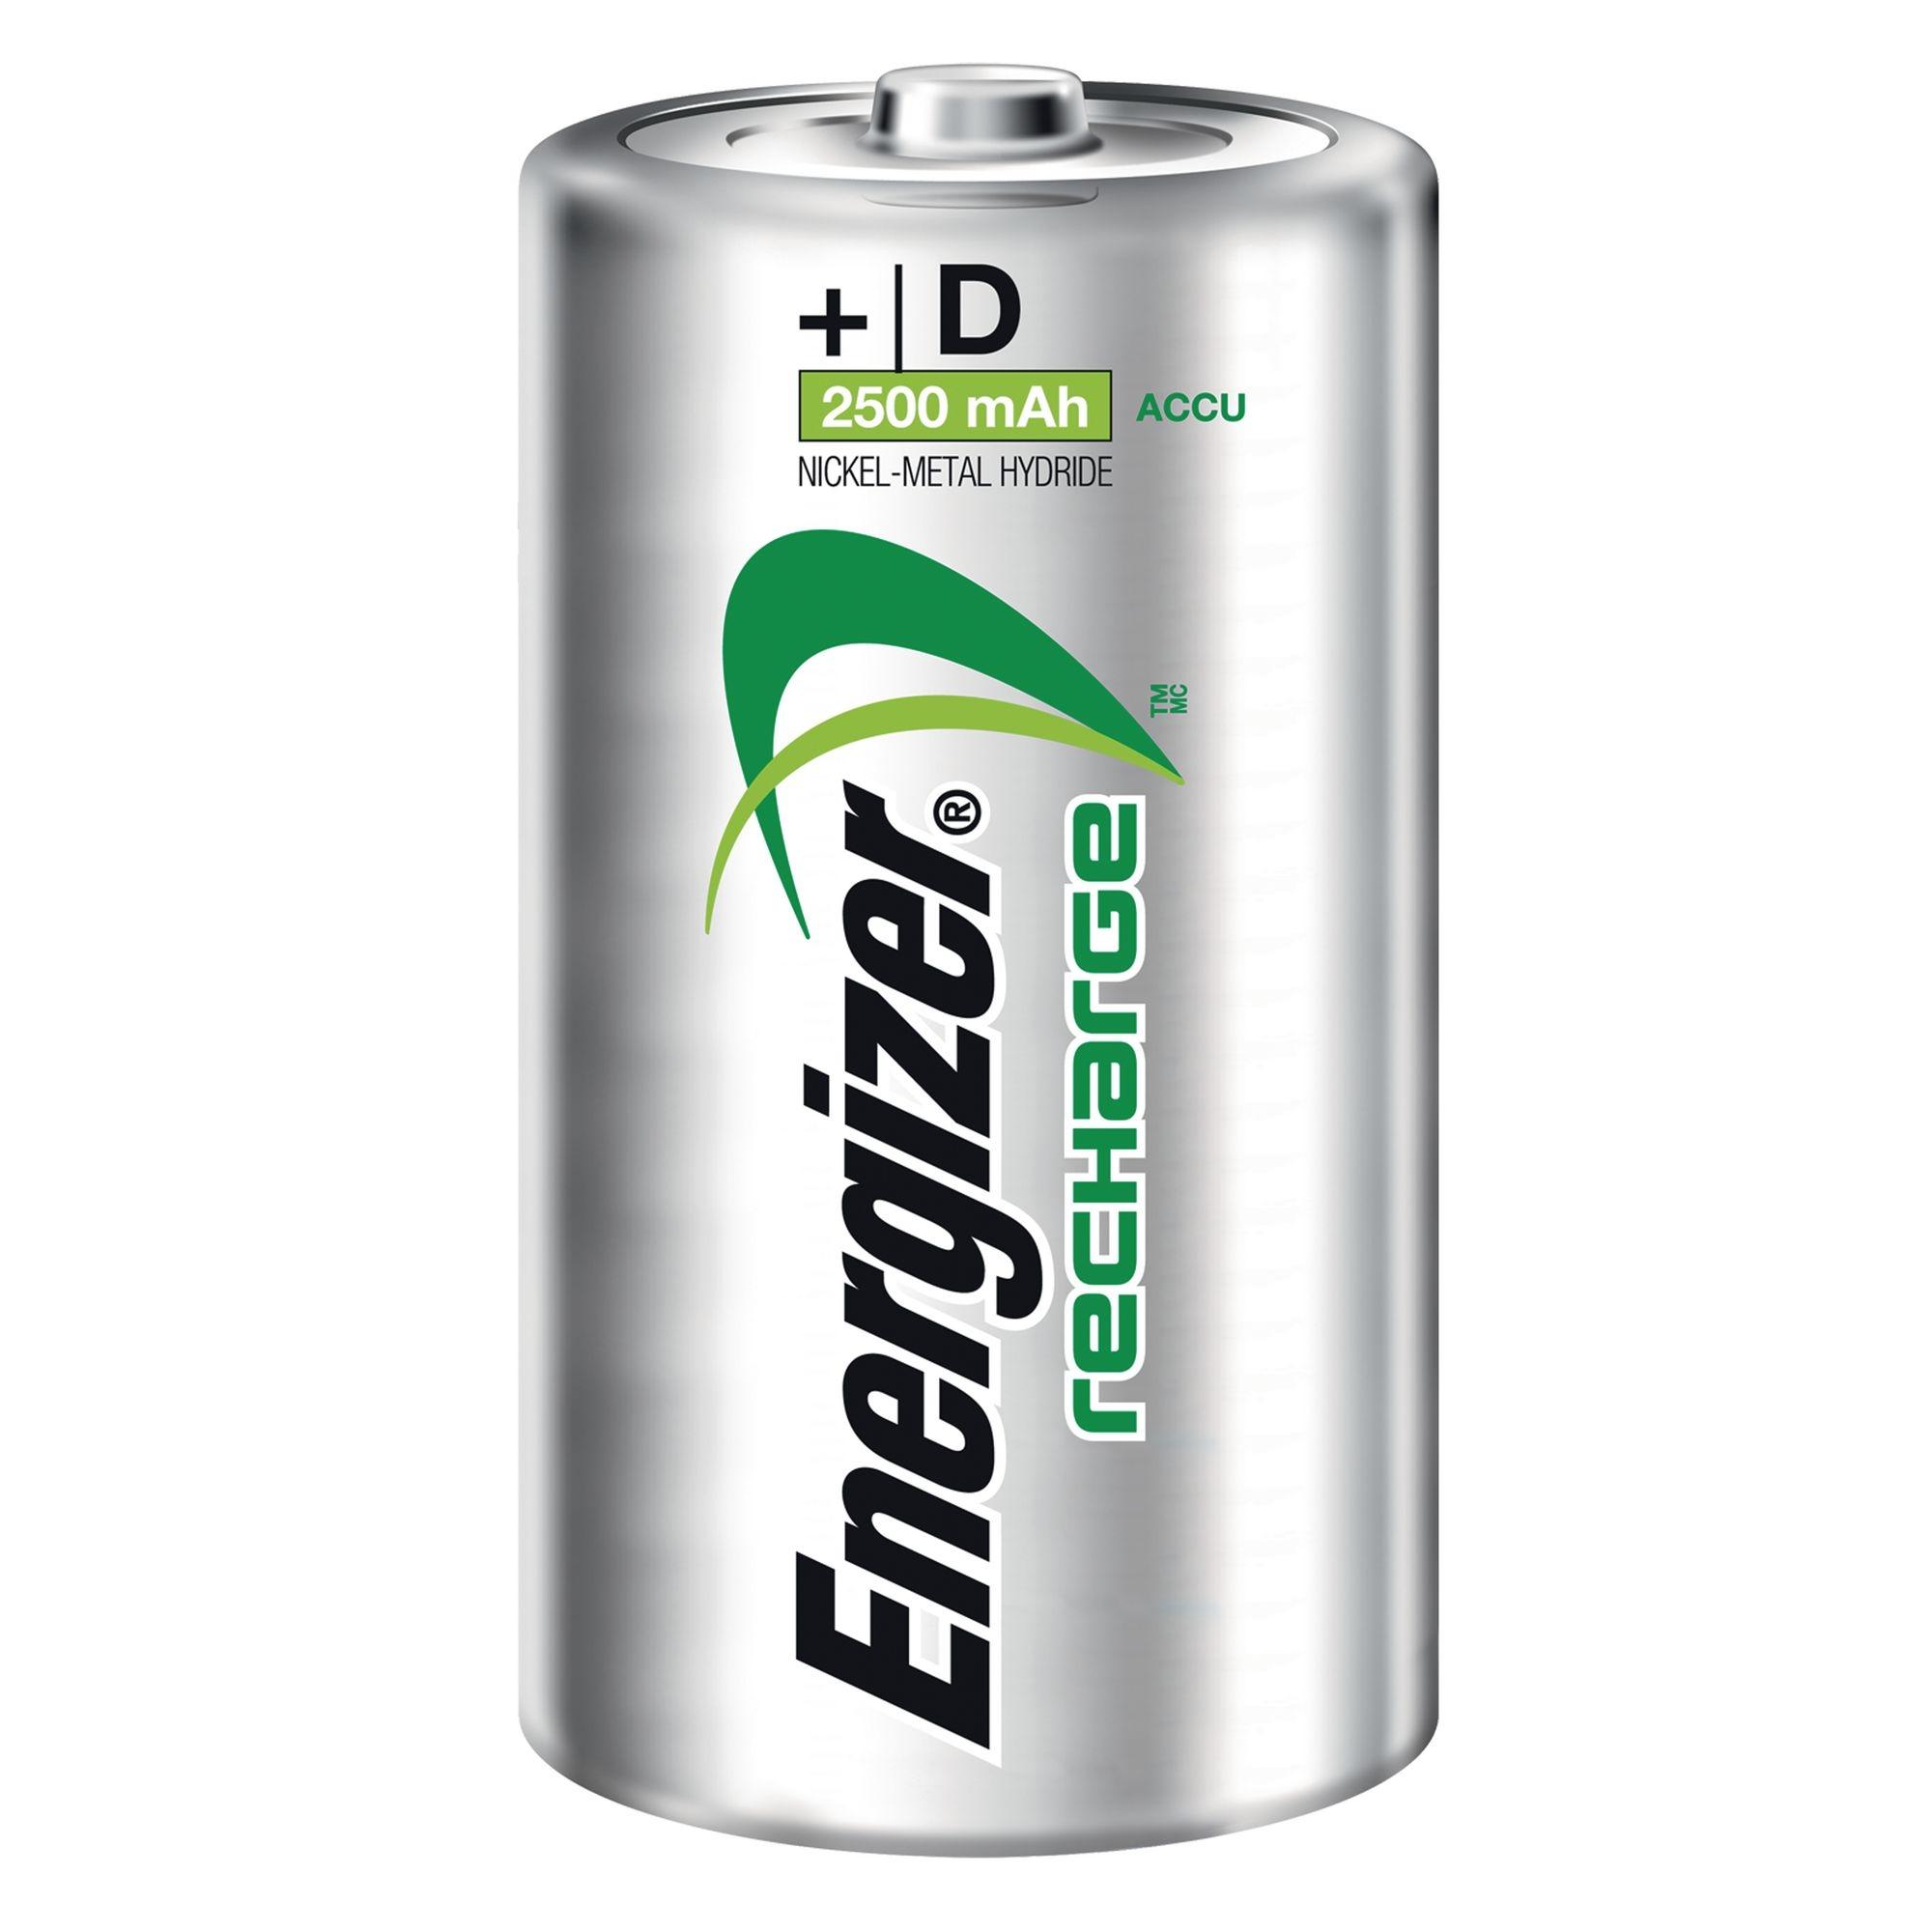 Rechargeable Battery D HR20 Pk2